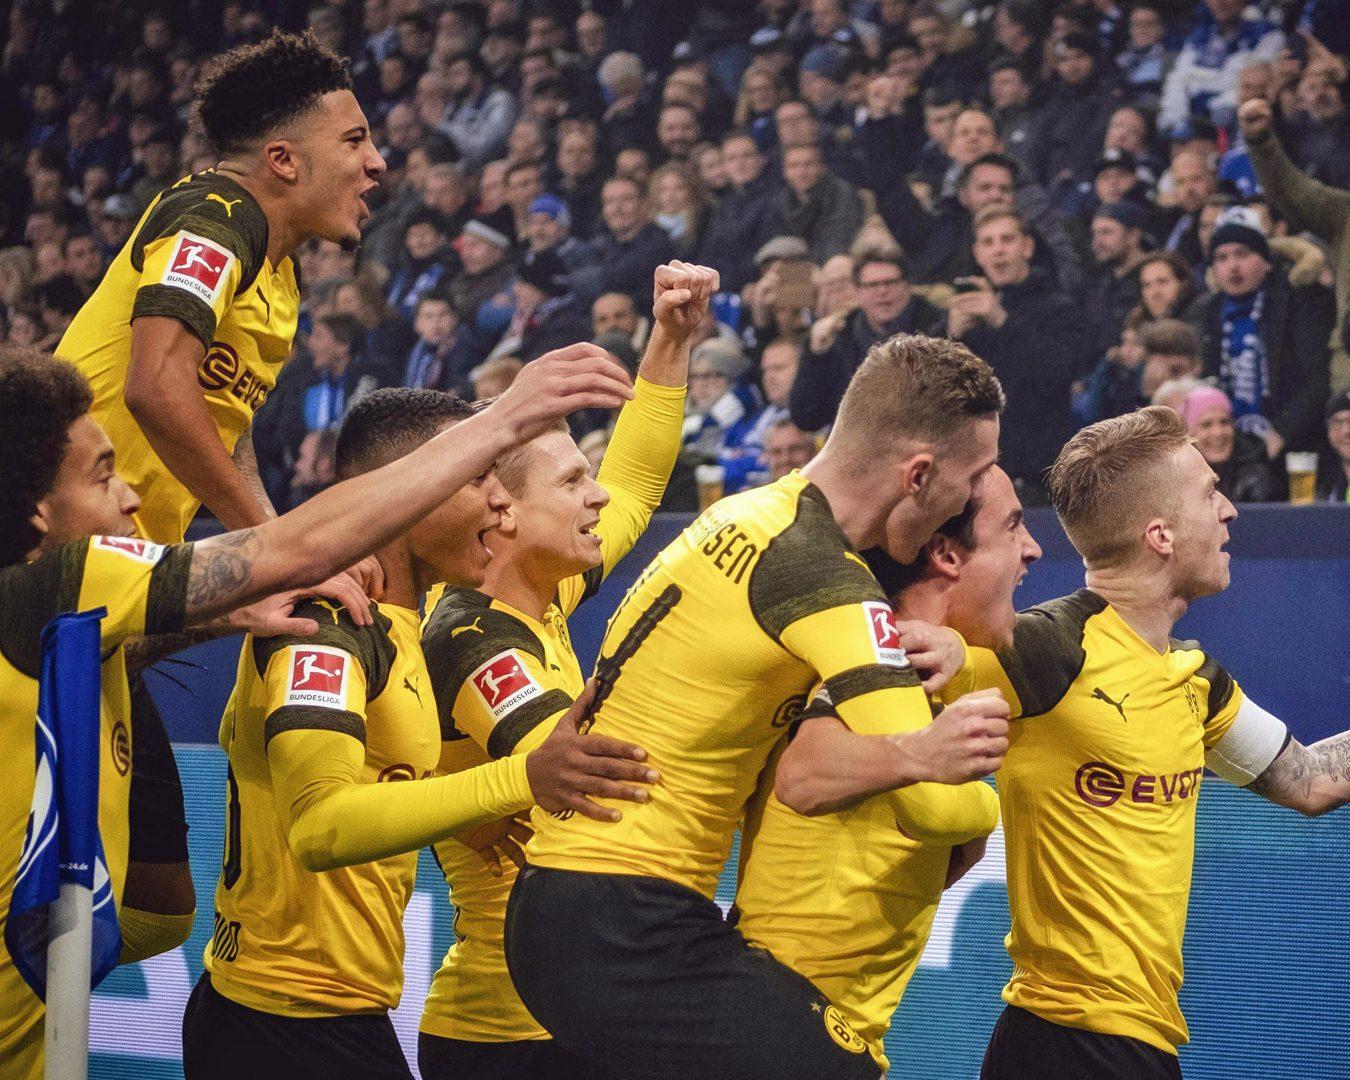 Revierderby last season - Dortmund team celebrate their goal